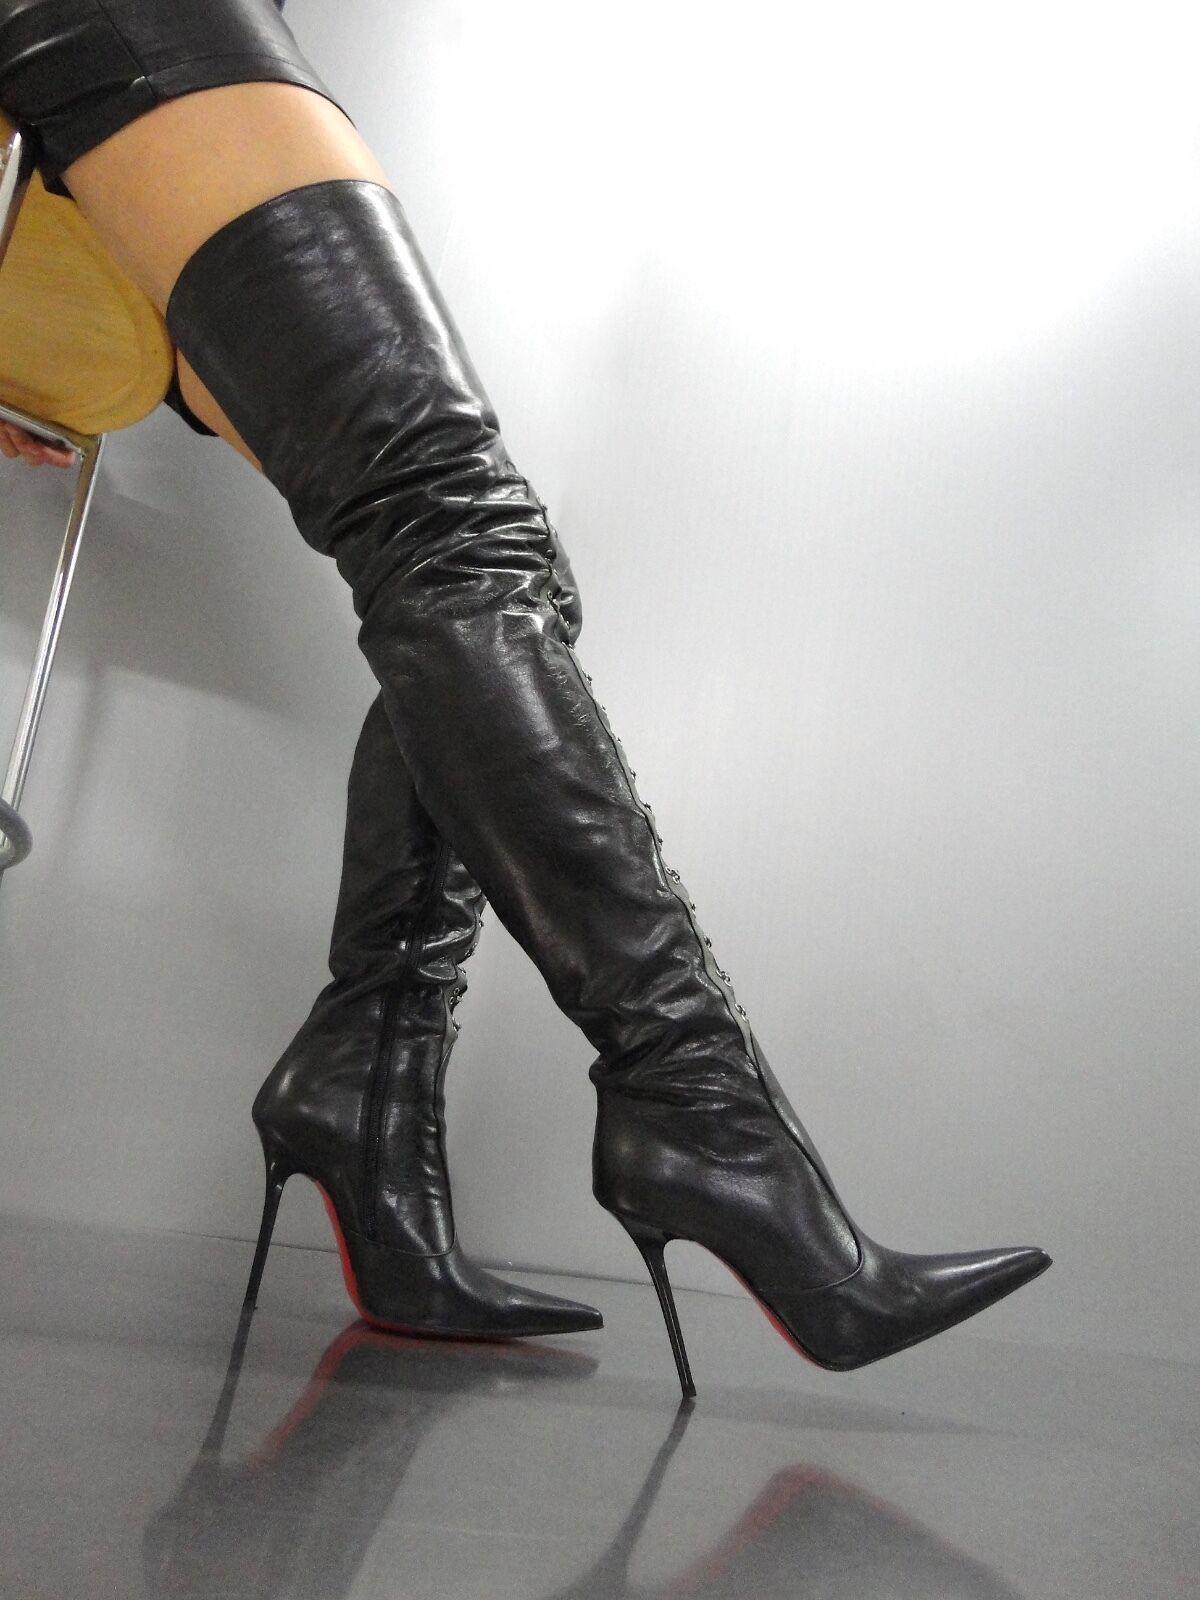 MORI ITALY SEXY OVERKNEE HIGH BOOTS STIEFEL STIVALI LEATHER CORSET black BLACK 39